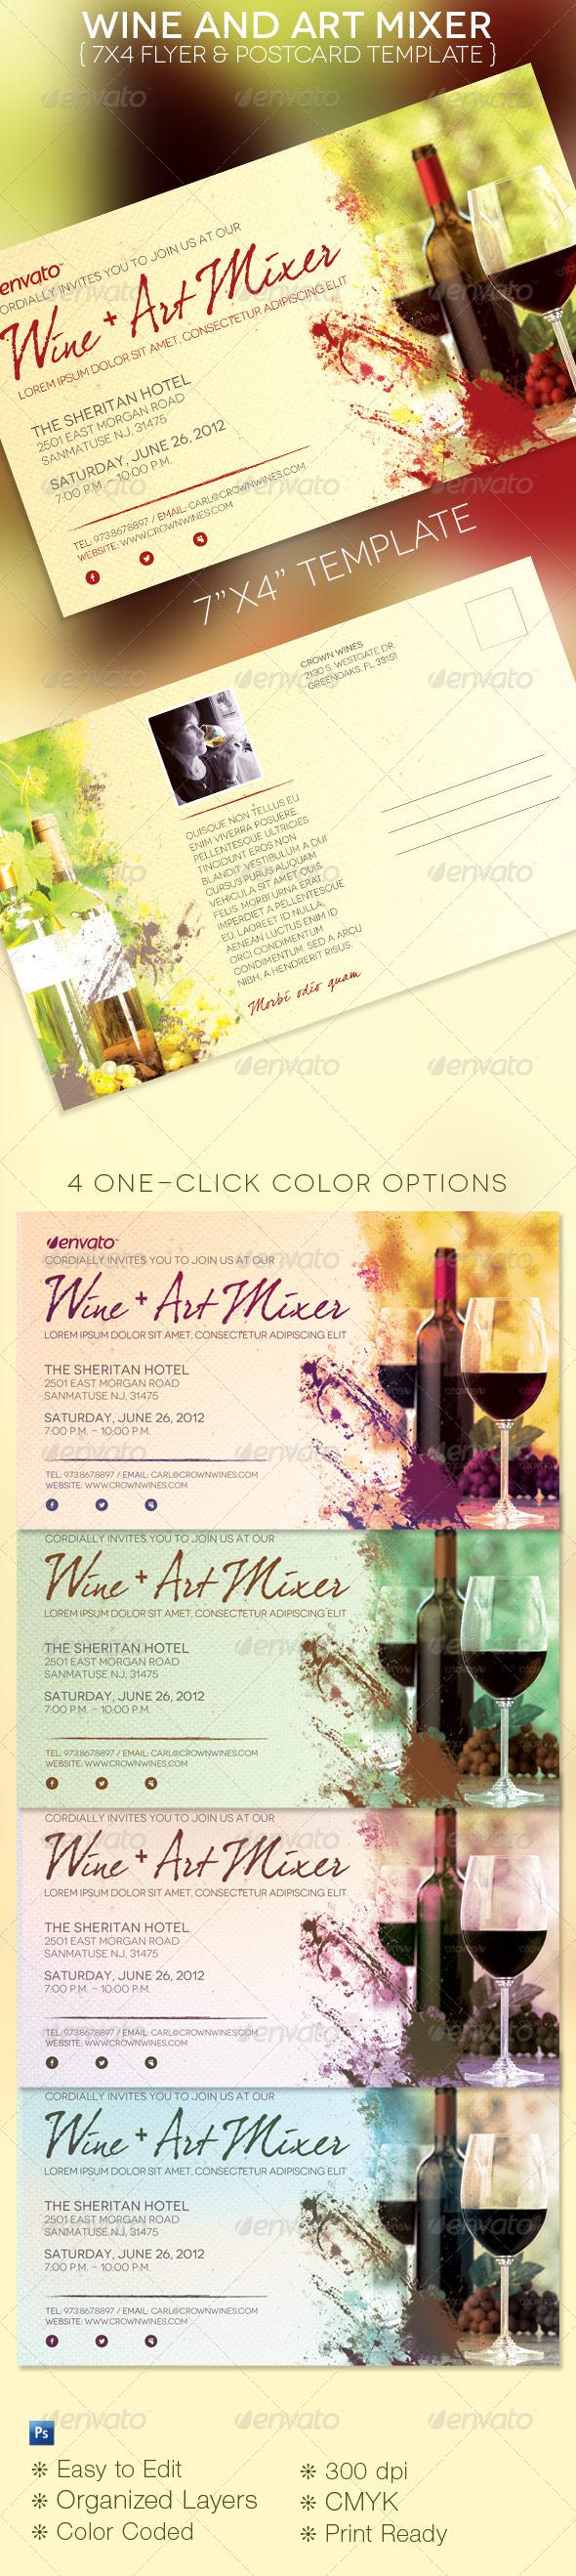 Wine Art Mixer Flyer Postcard Template - Restaurant Flyers